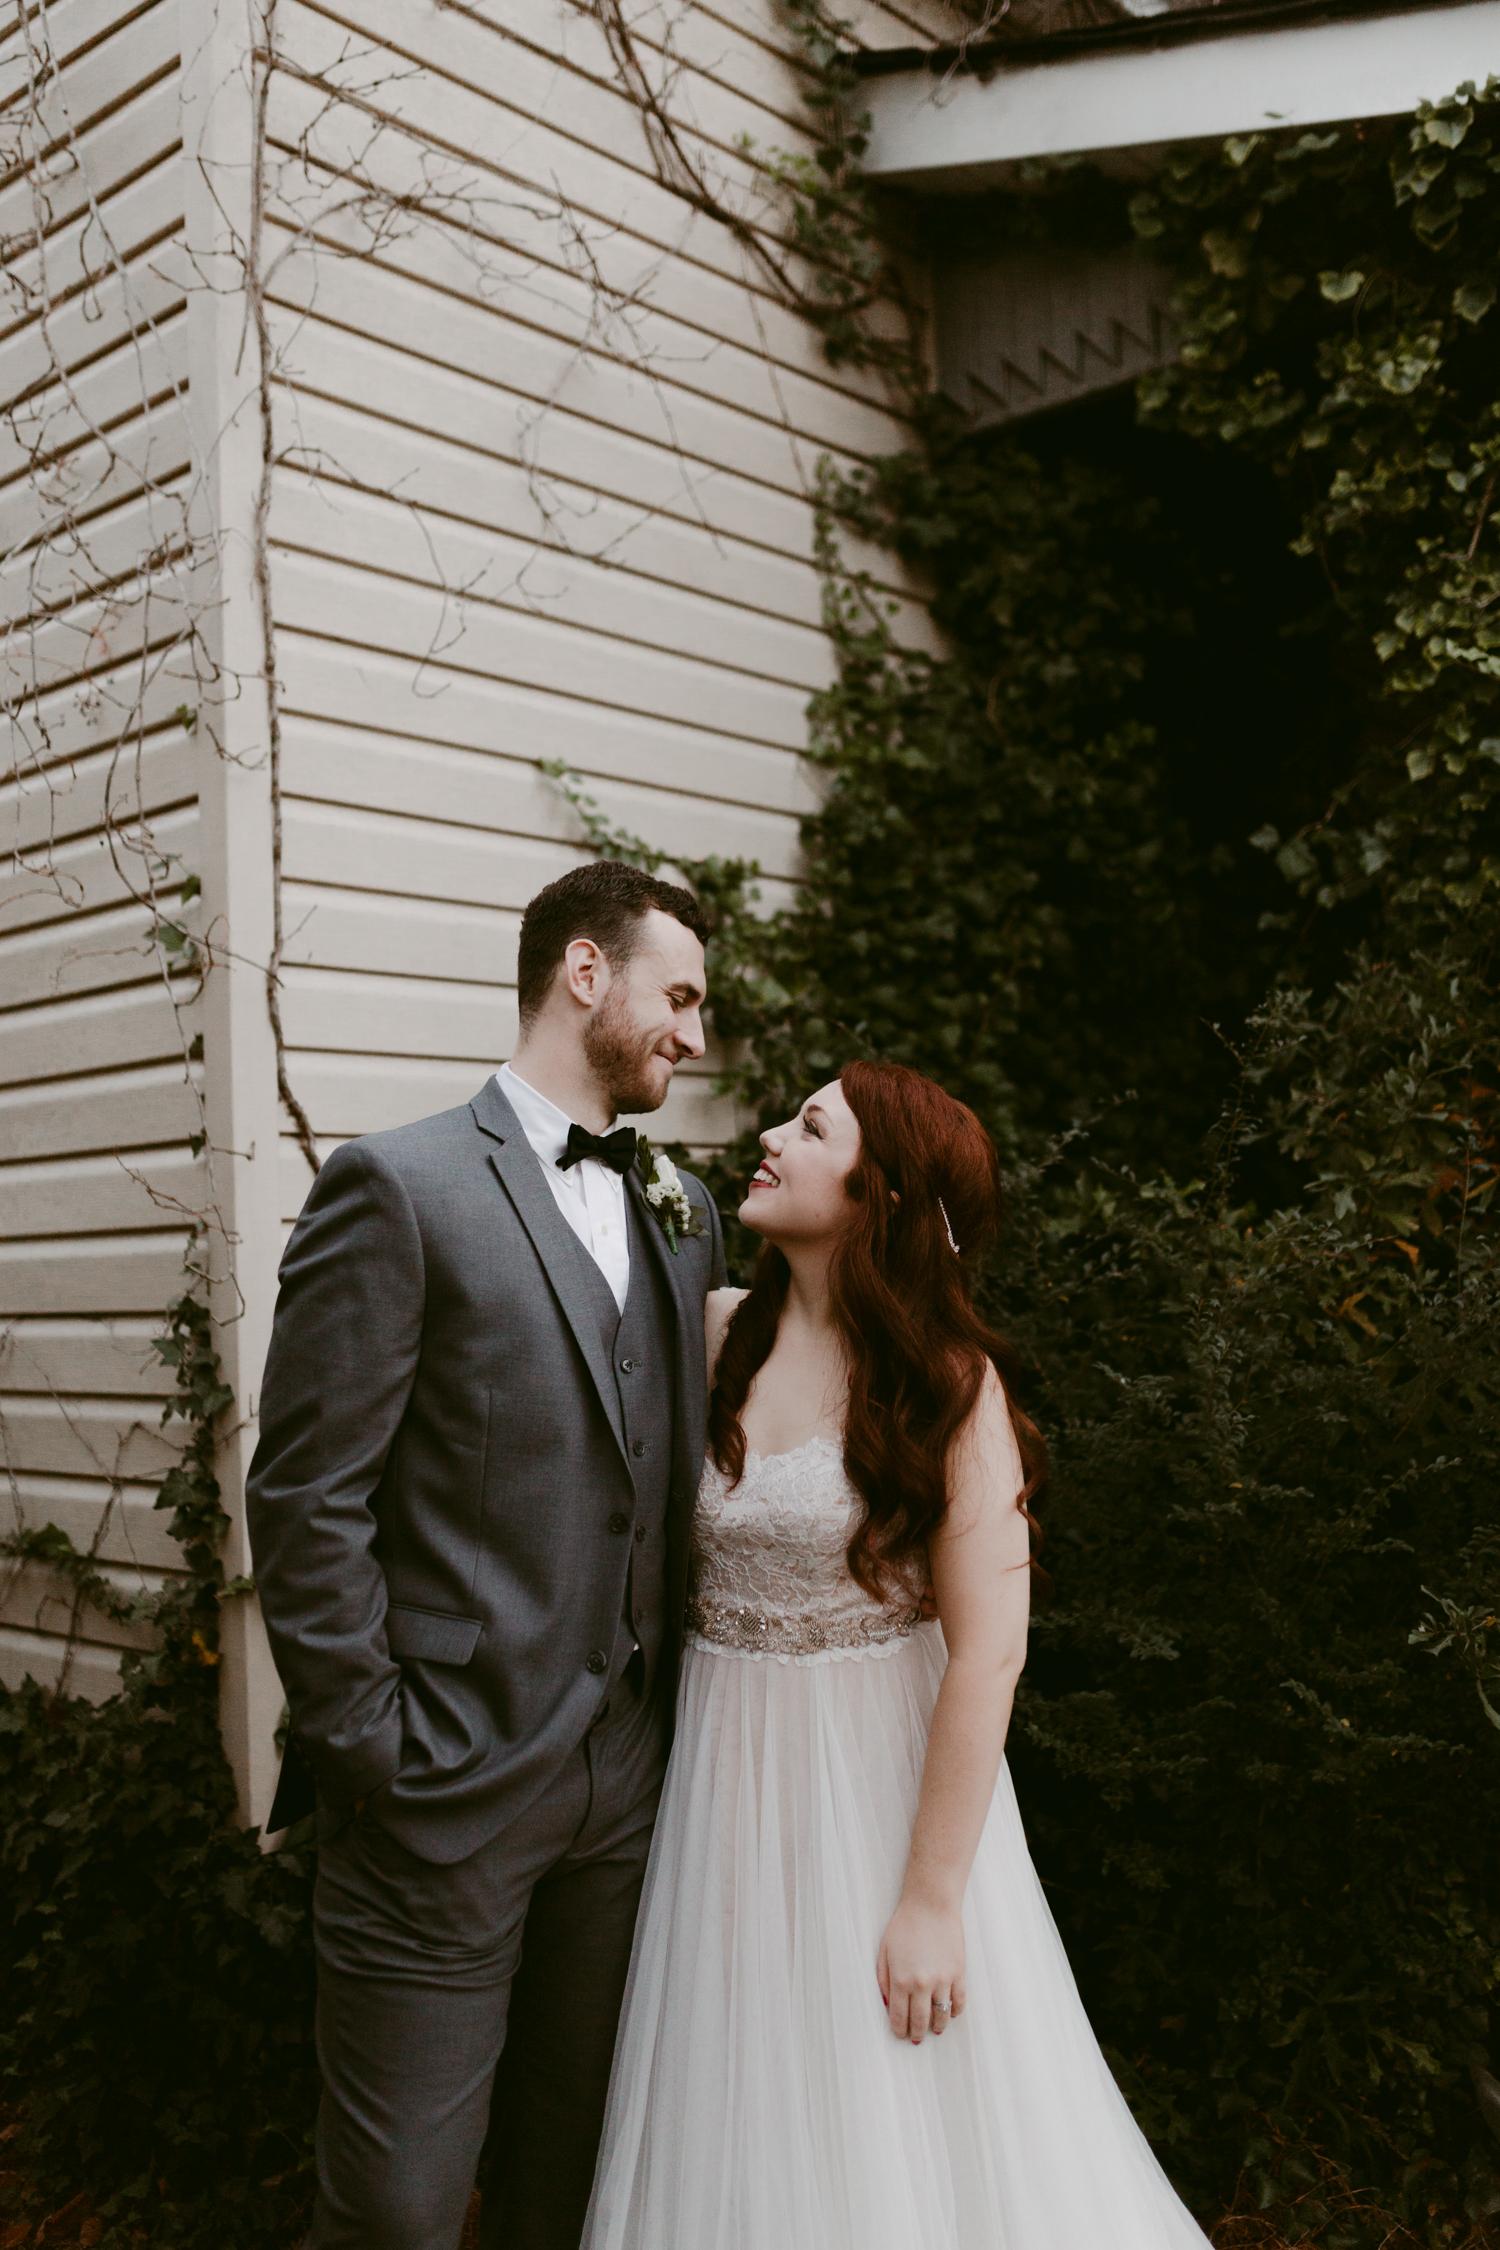 Yellow+Bird+Visuals+Destination+Wedding+Photographer-7763